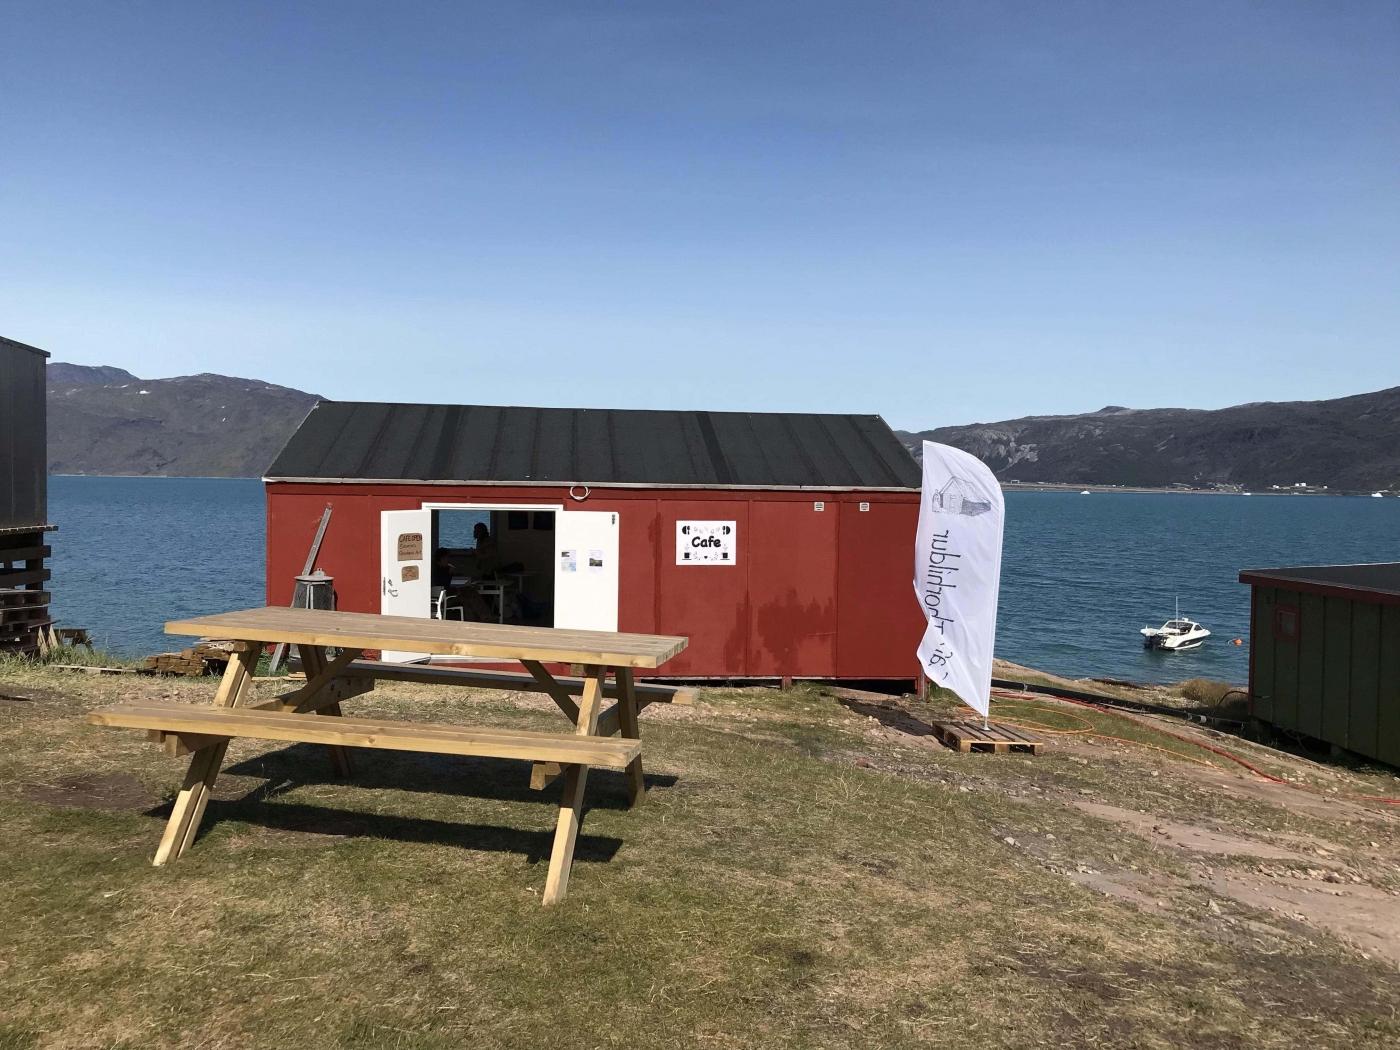 Cafe Thorhildur front with landscape in background